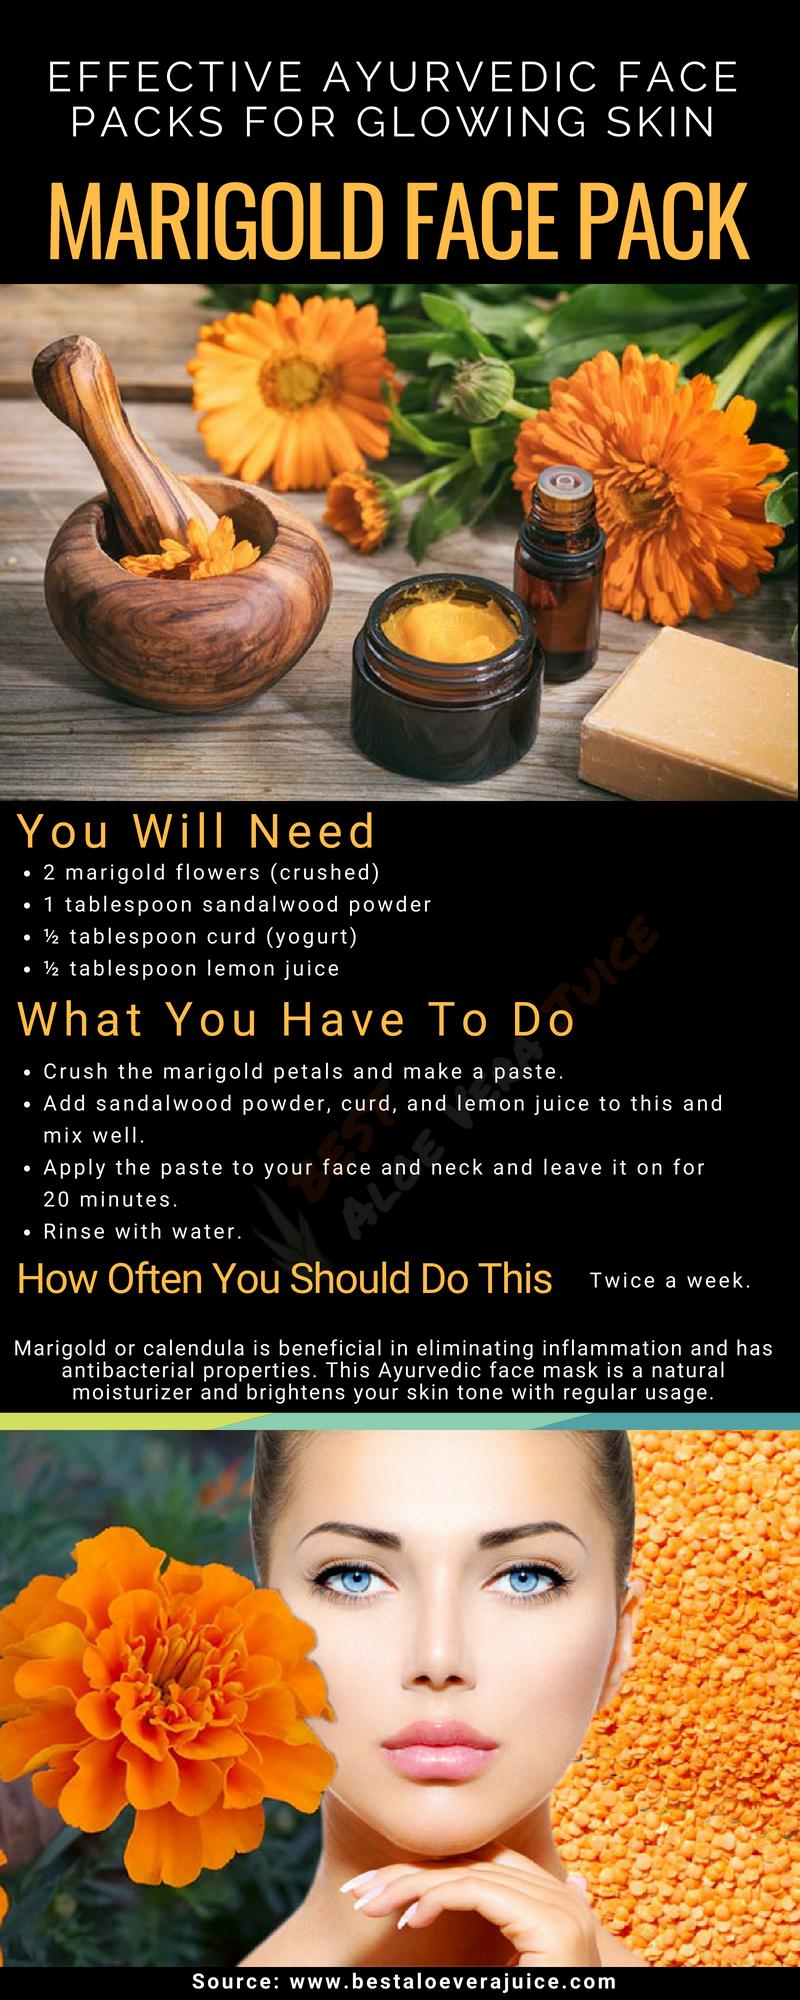 Effective Ayurvedic Face Packs For Glowing Skin #Marigold